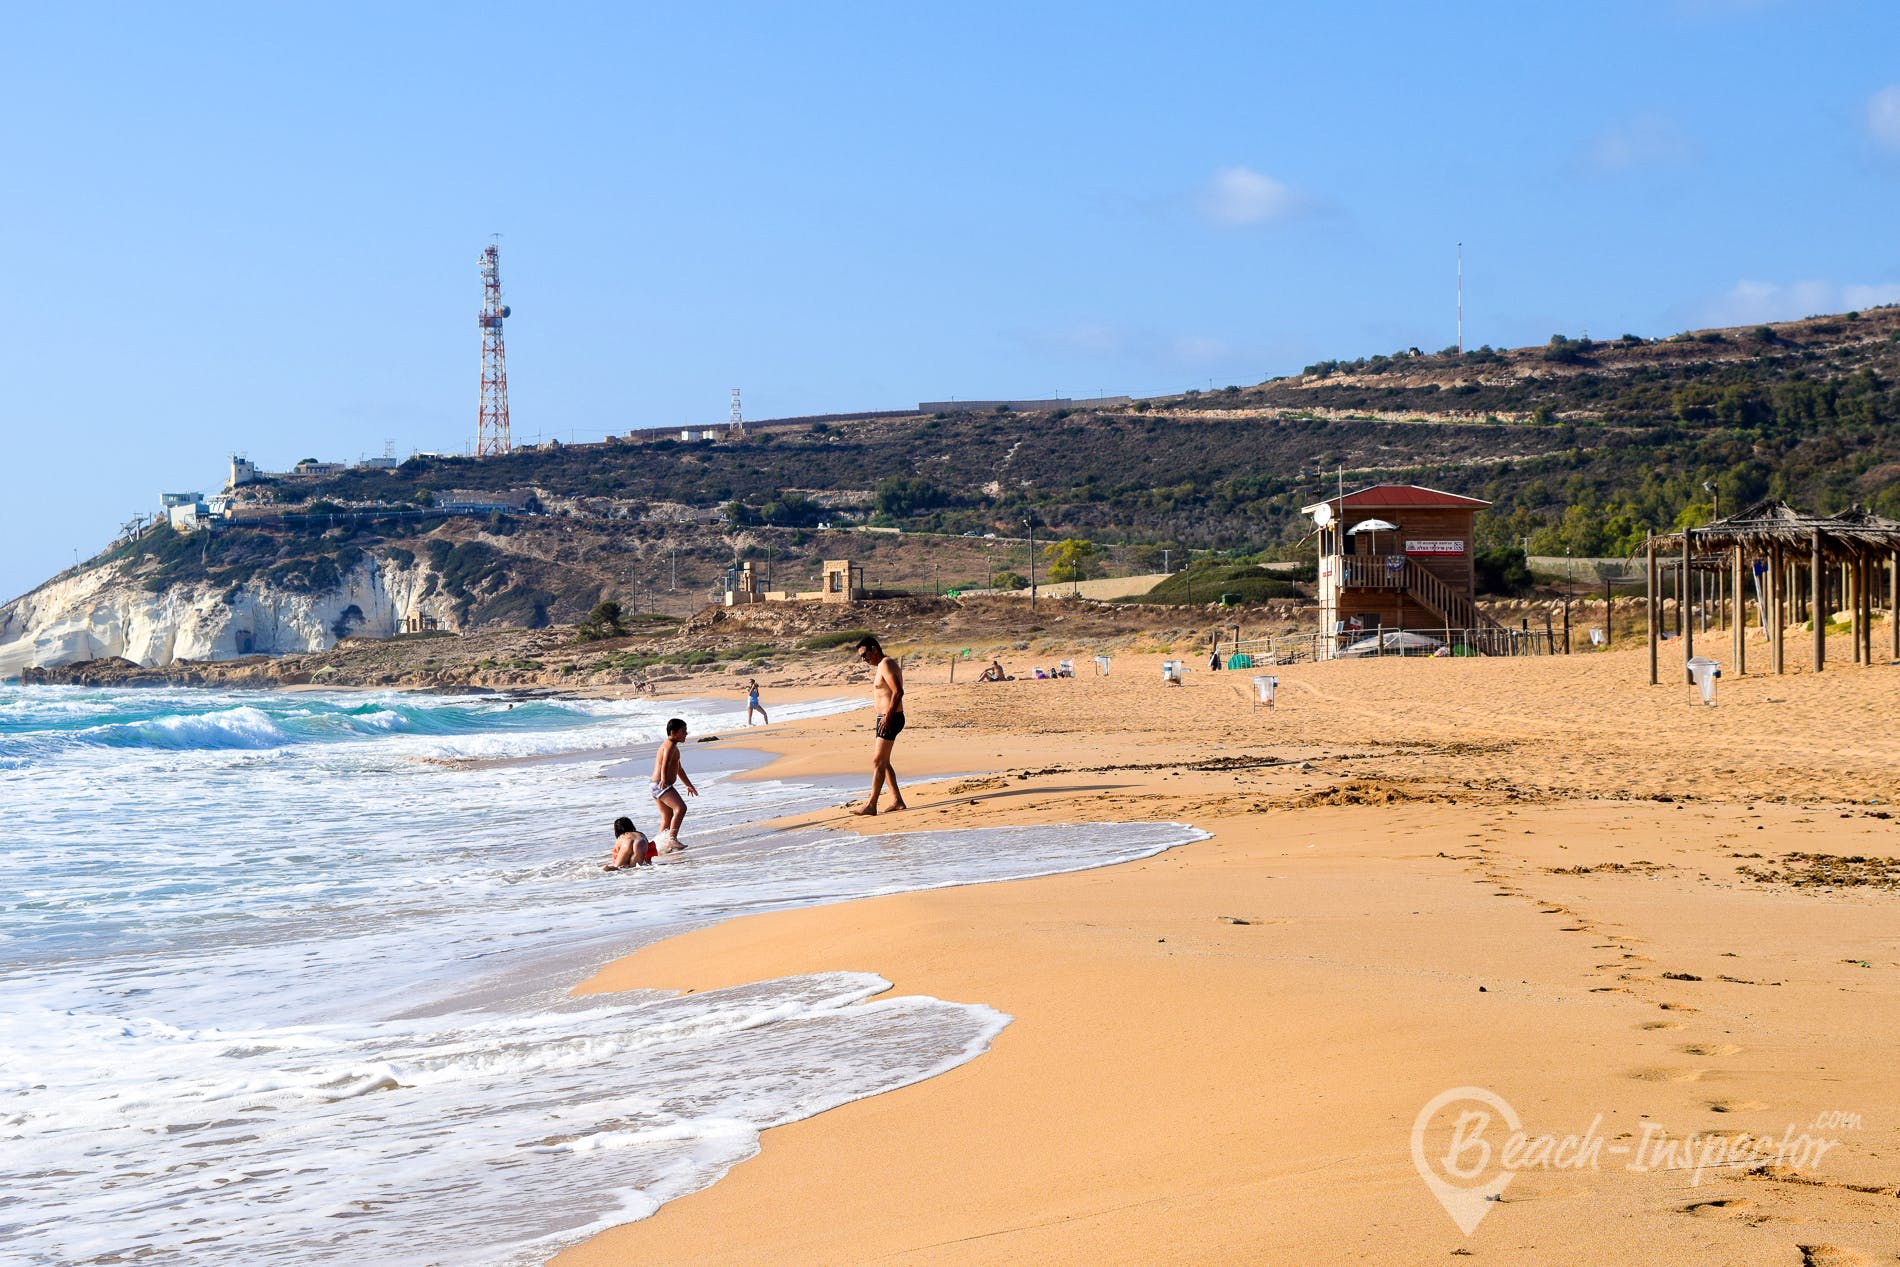 Playa Betzet Beach, Israel, Israel